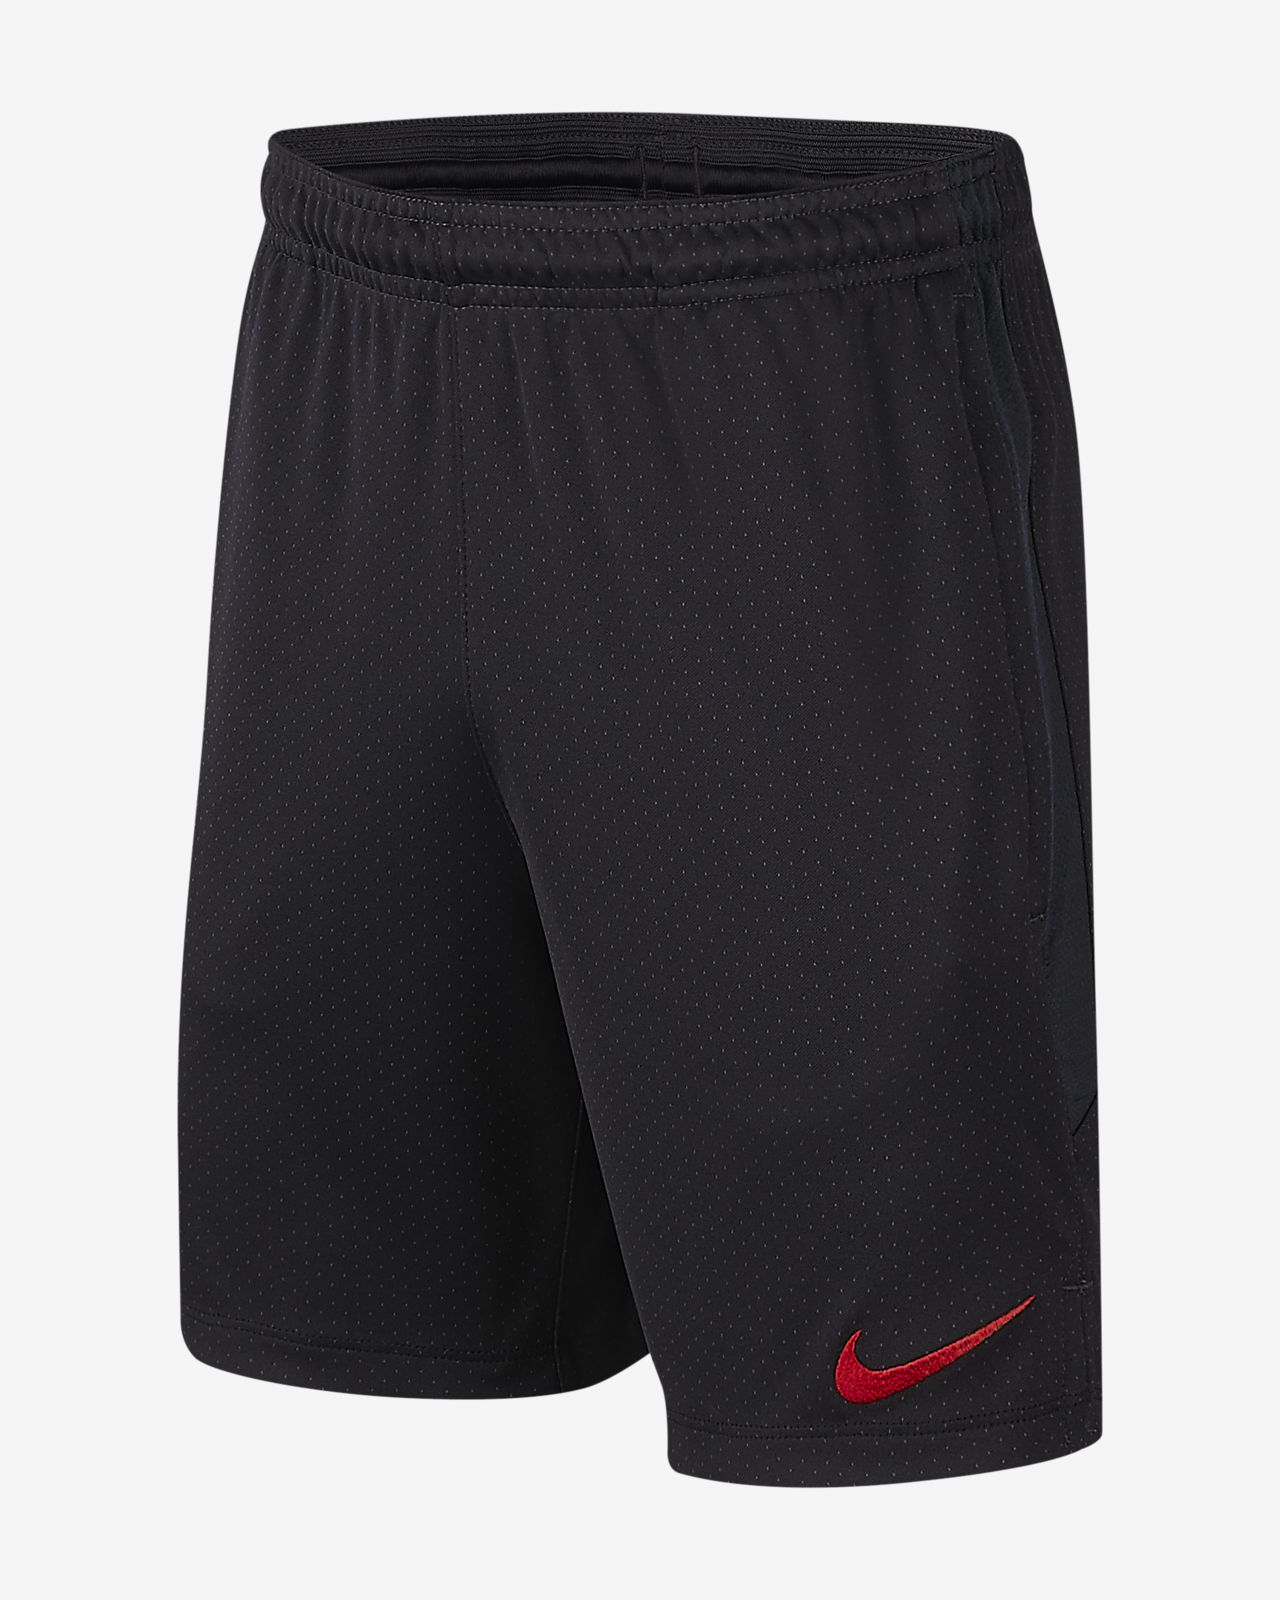 Nike Dri-FIT París Saint-Germain Strike Pantalón corto de fútbol - Niño/a